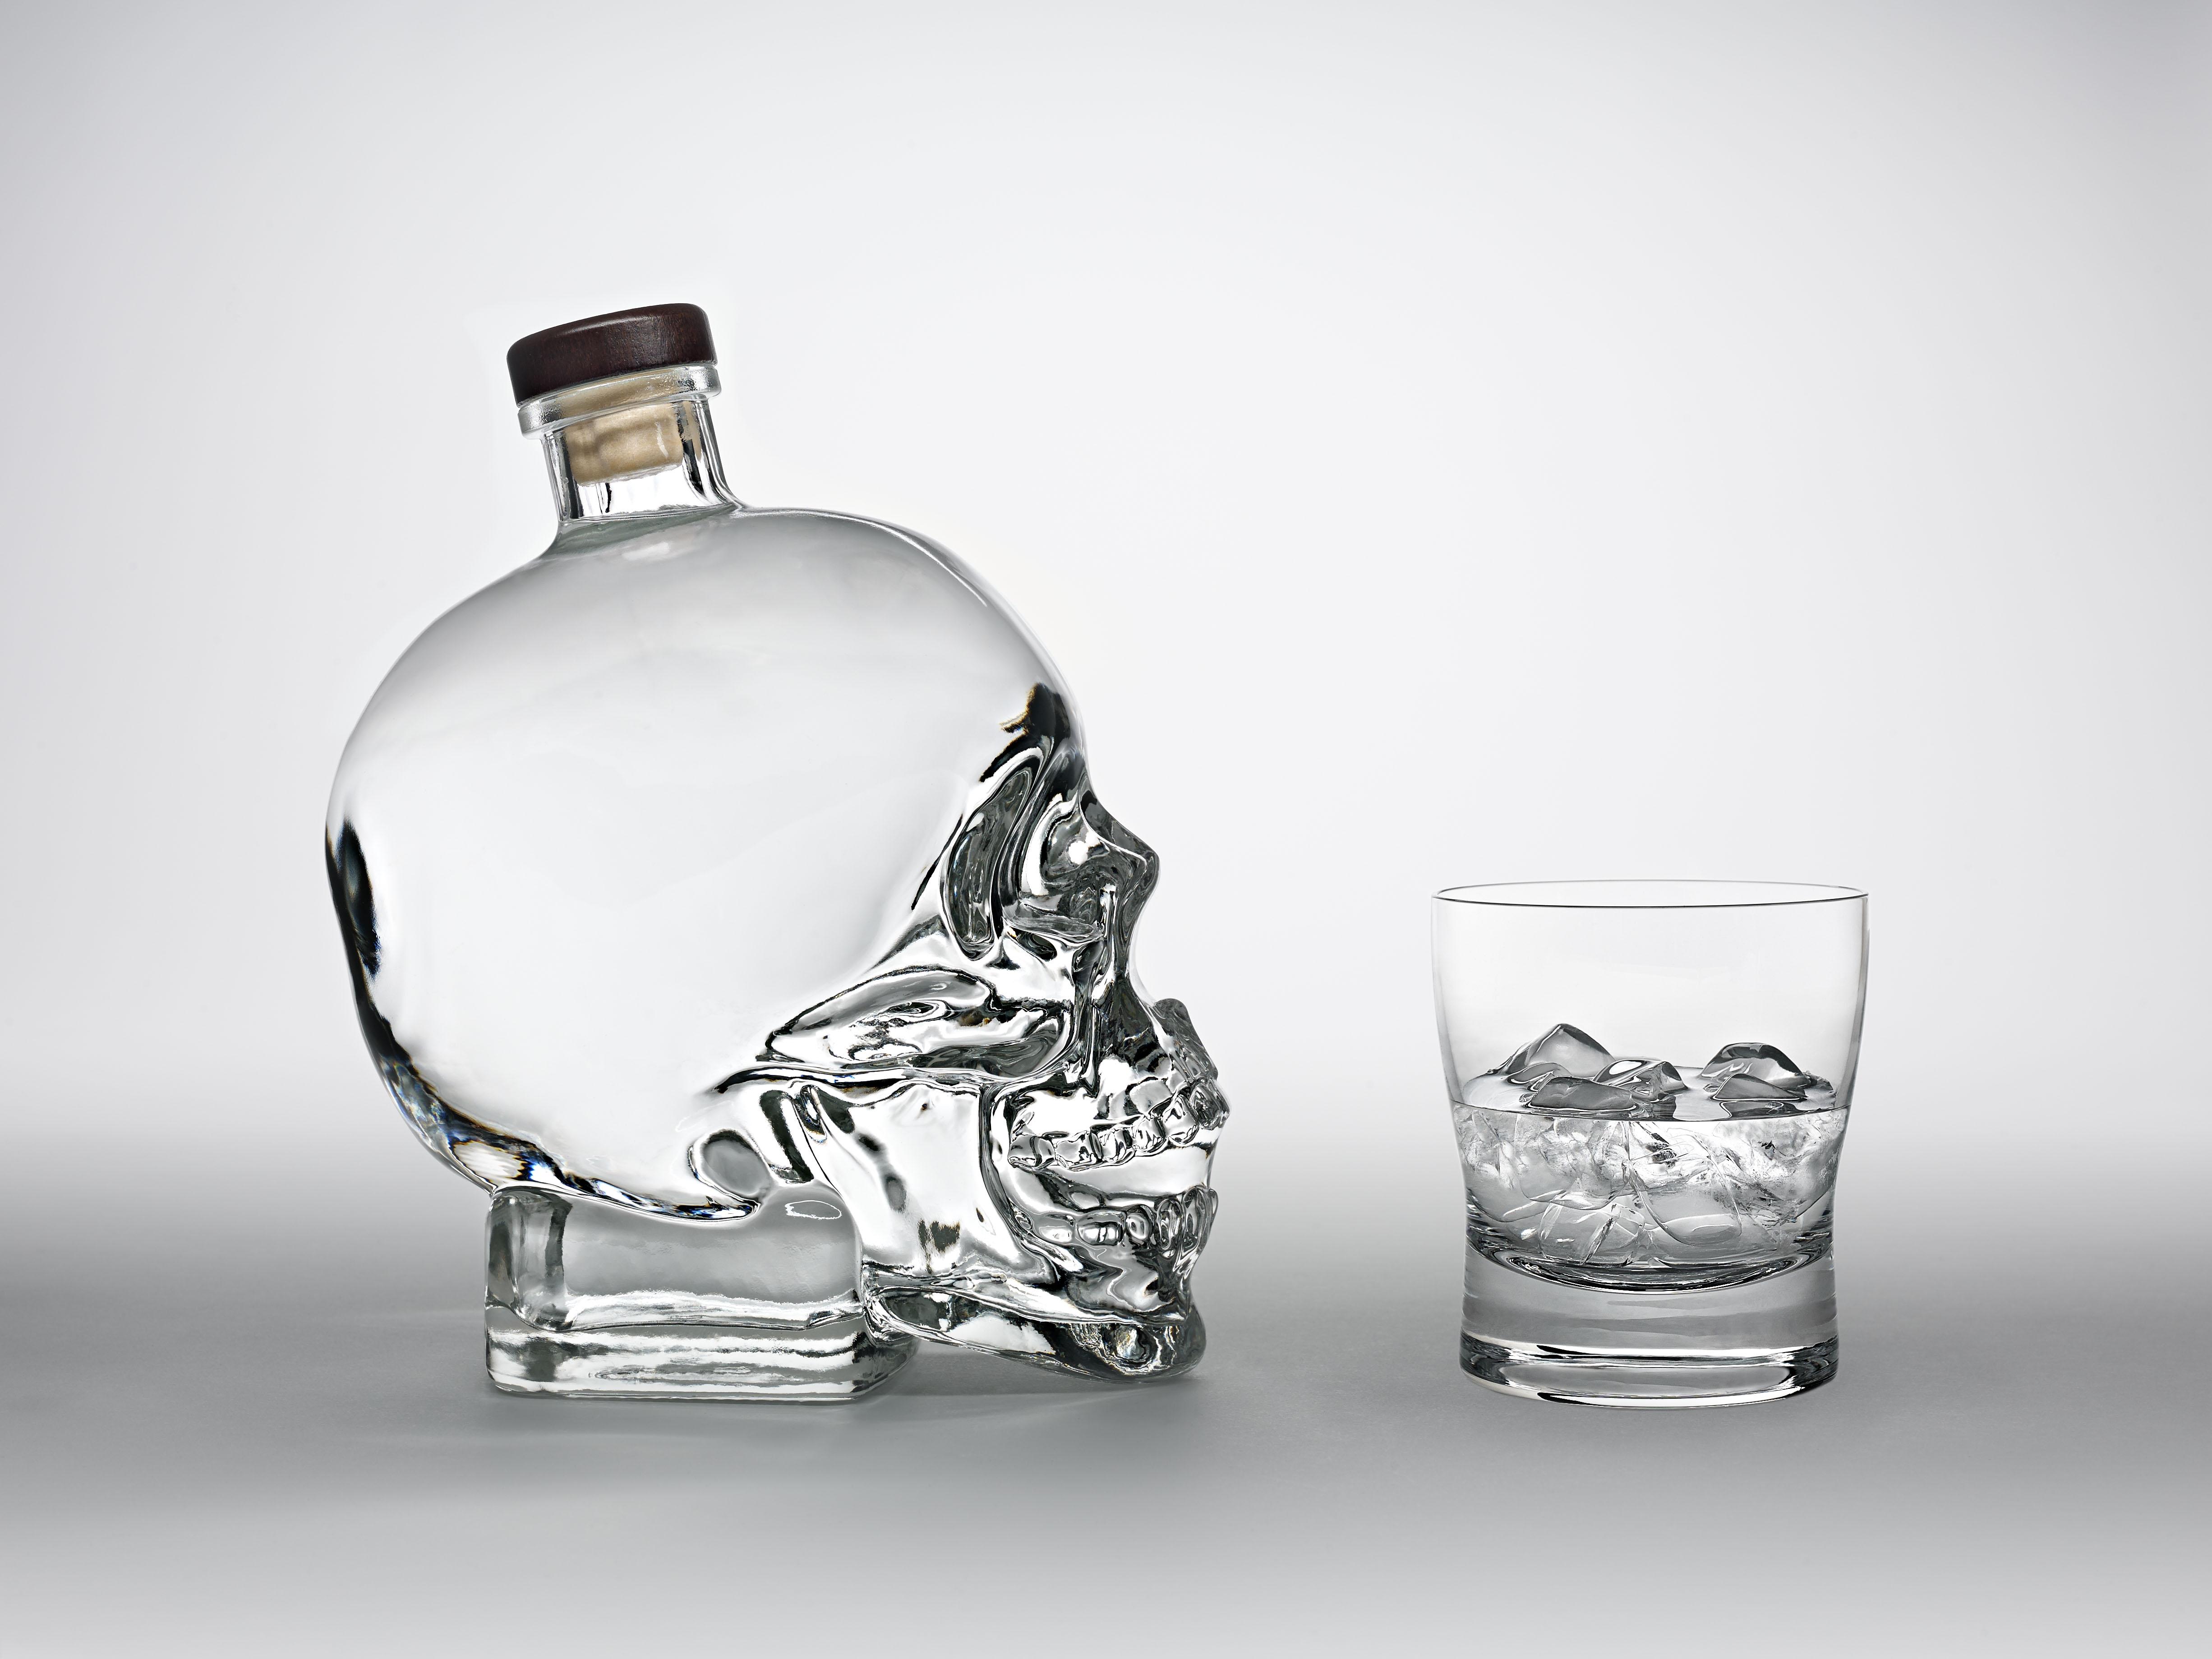 FULL BOTTLE GLASS COMP RT SD FINAL 8 BIT